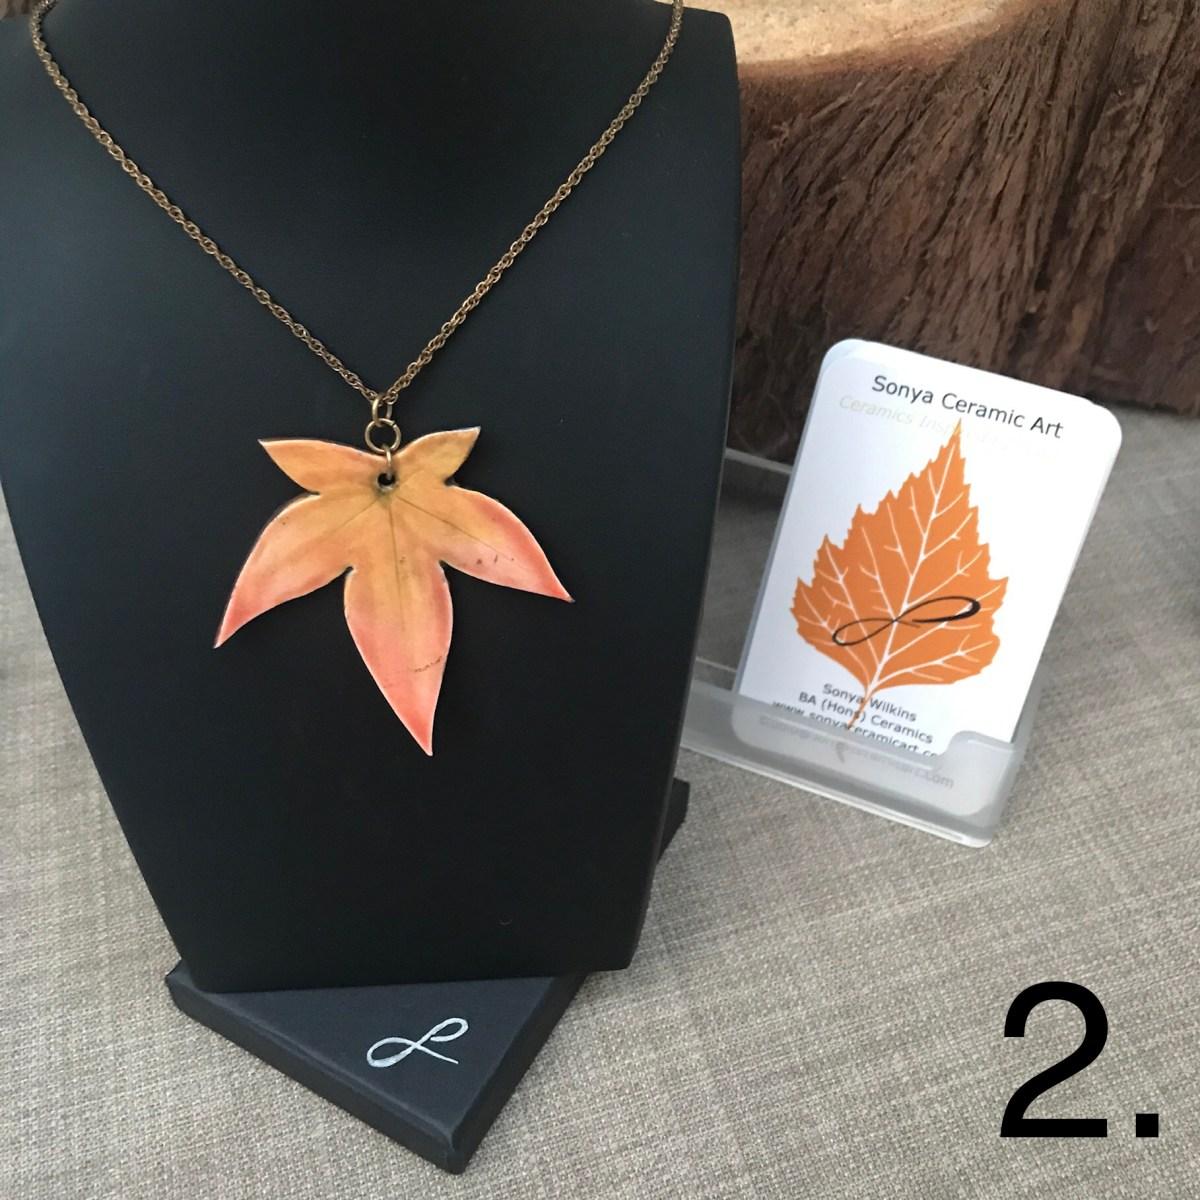 Coral Maple Leaf Pendant by Sonya Ceramic Art